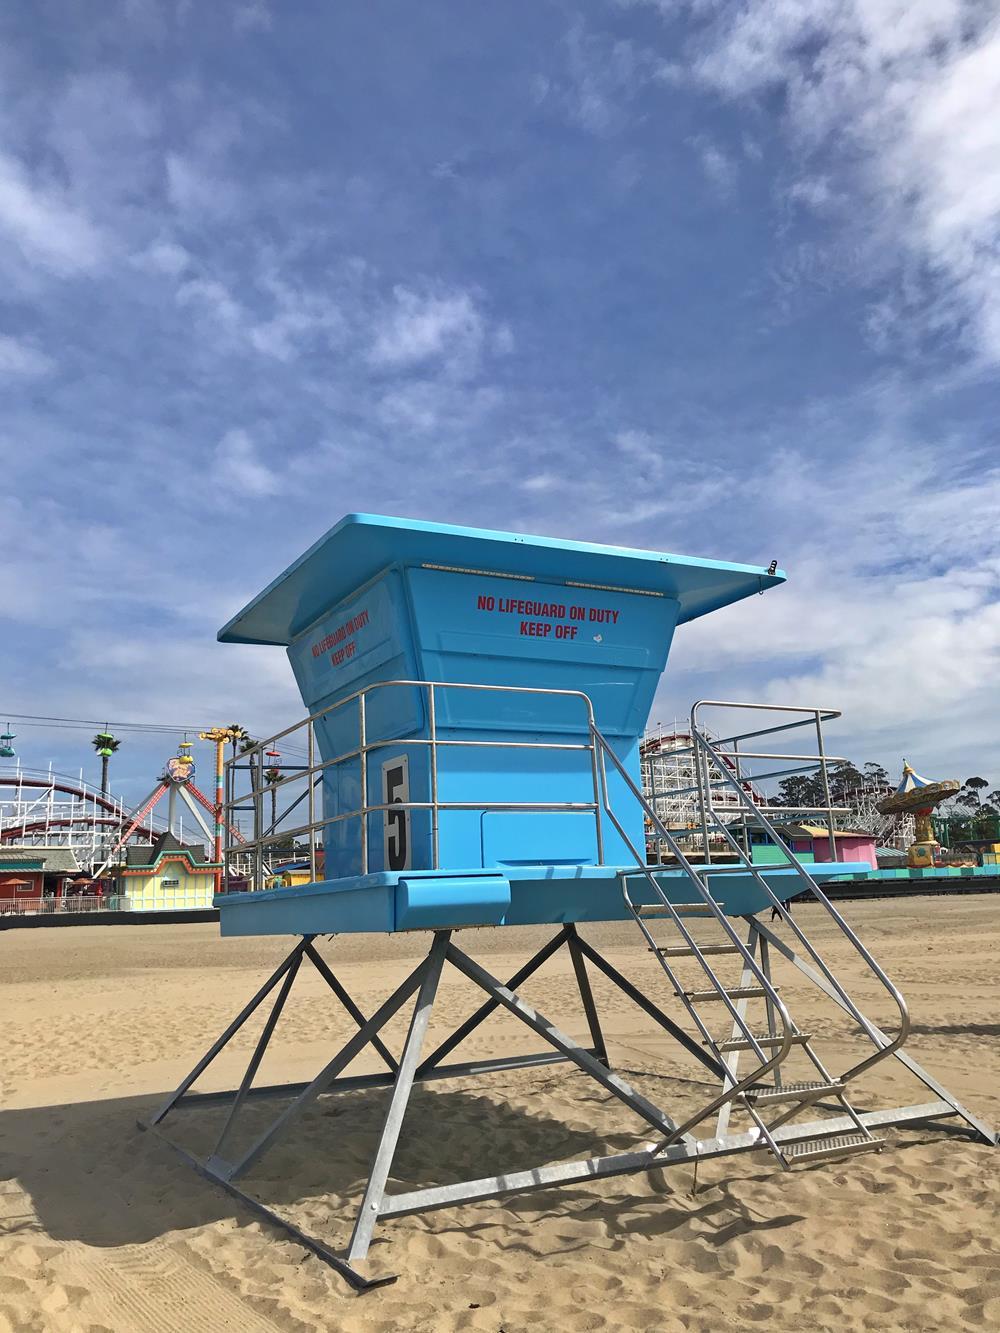 A bright blue lifeguard shelter on Santa Cruz beach